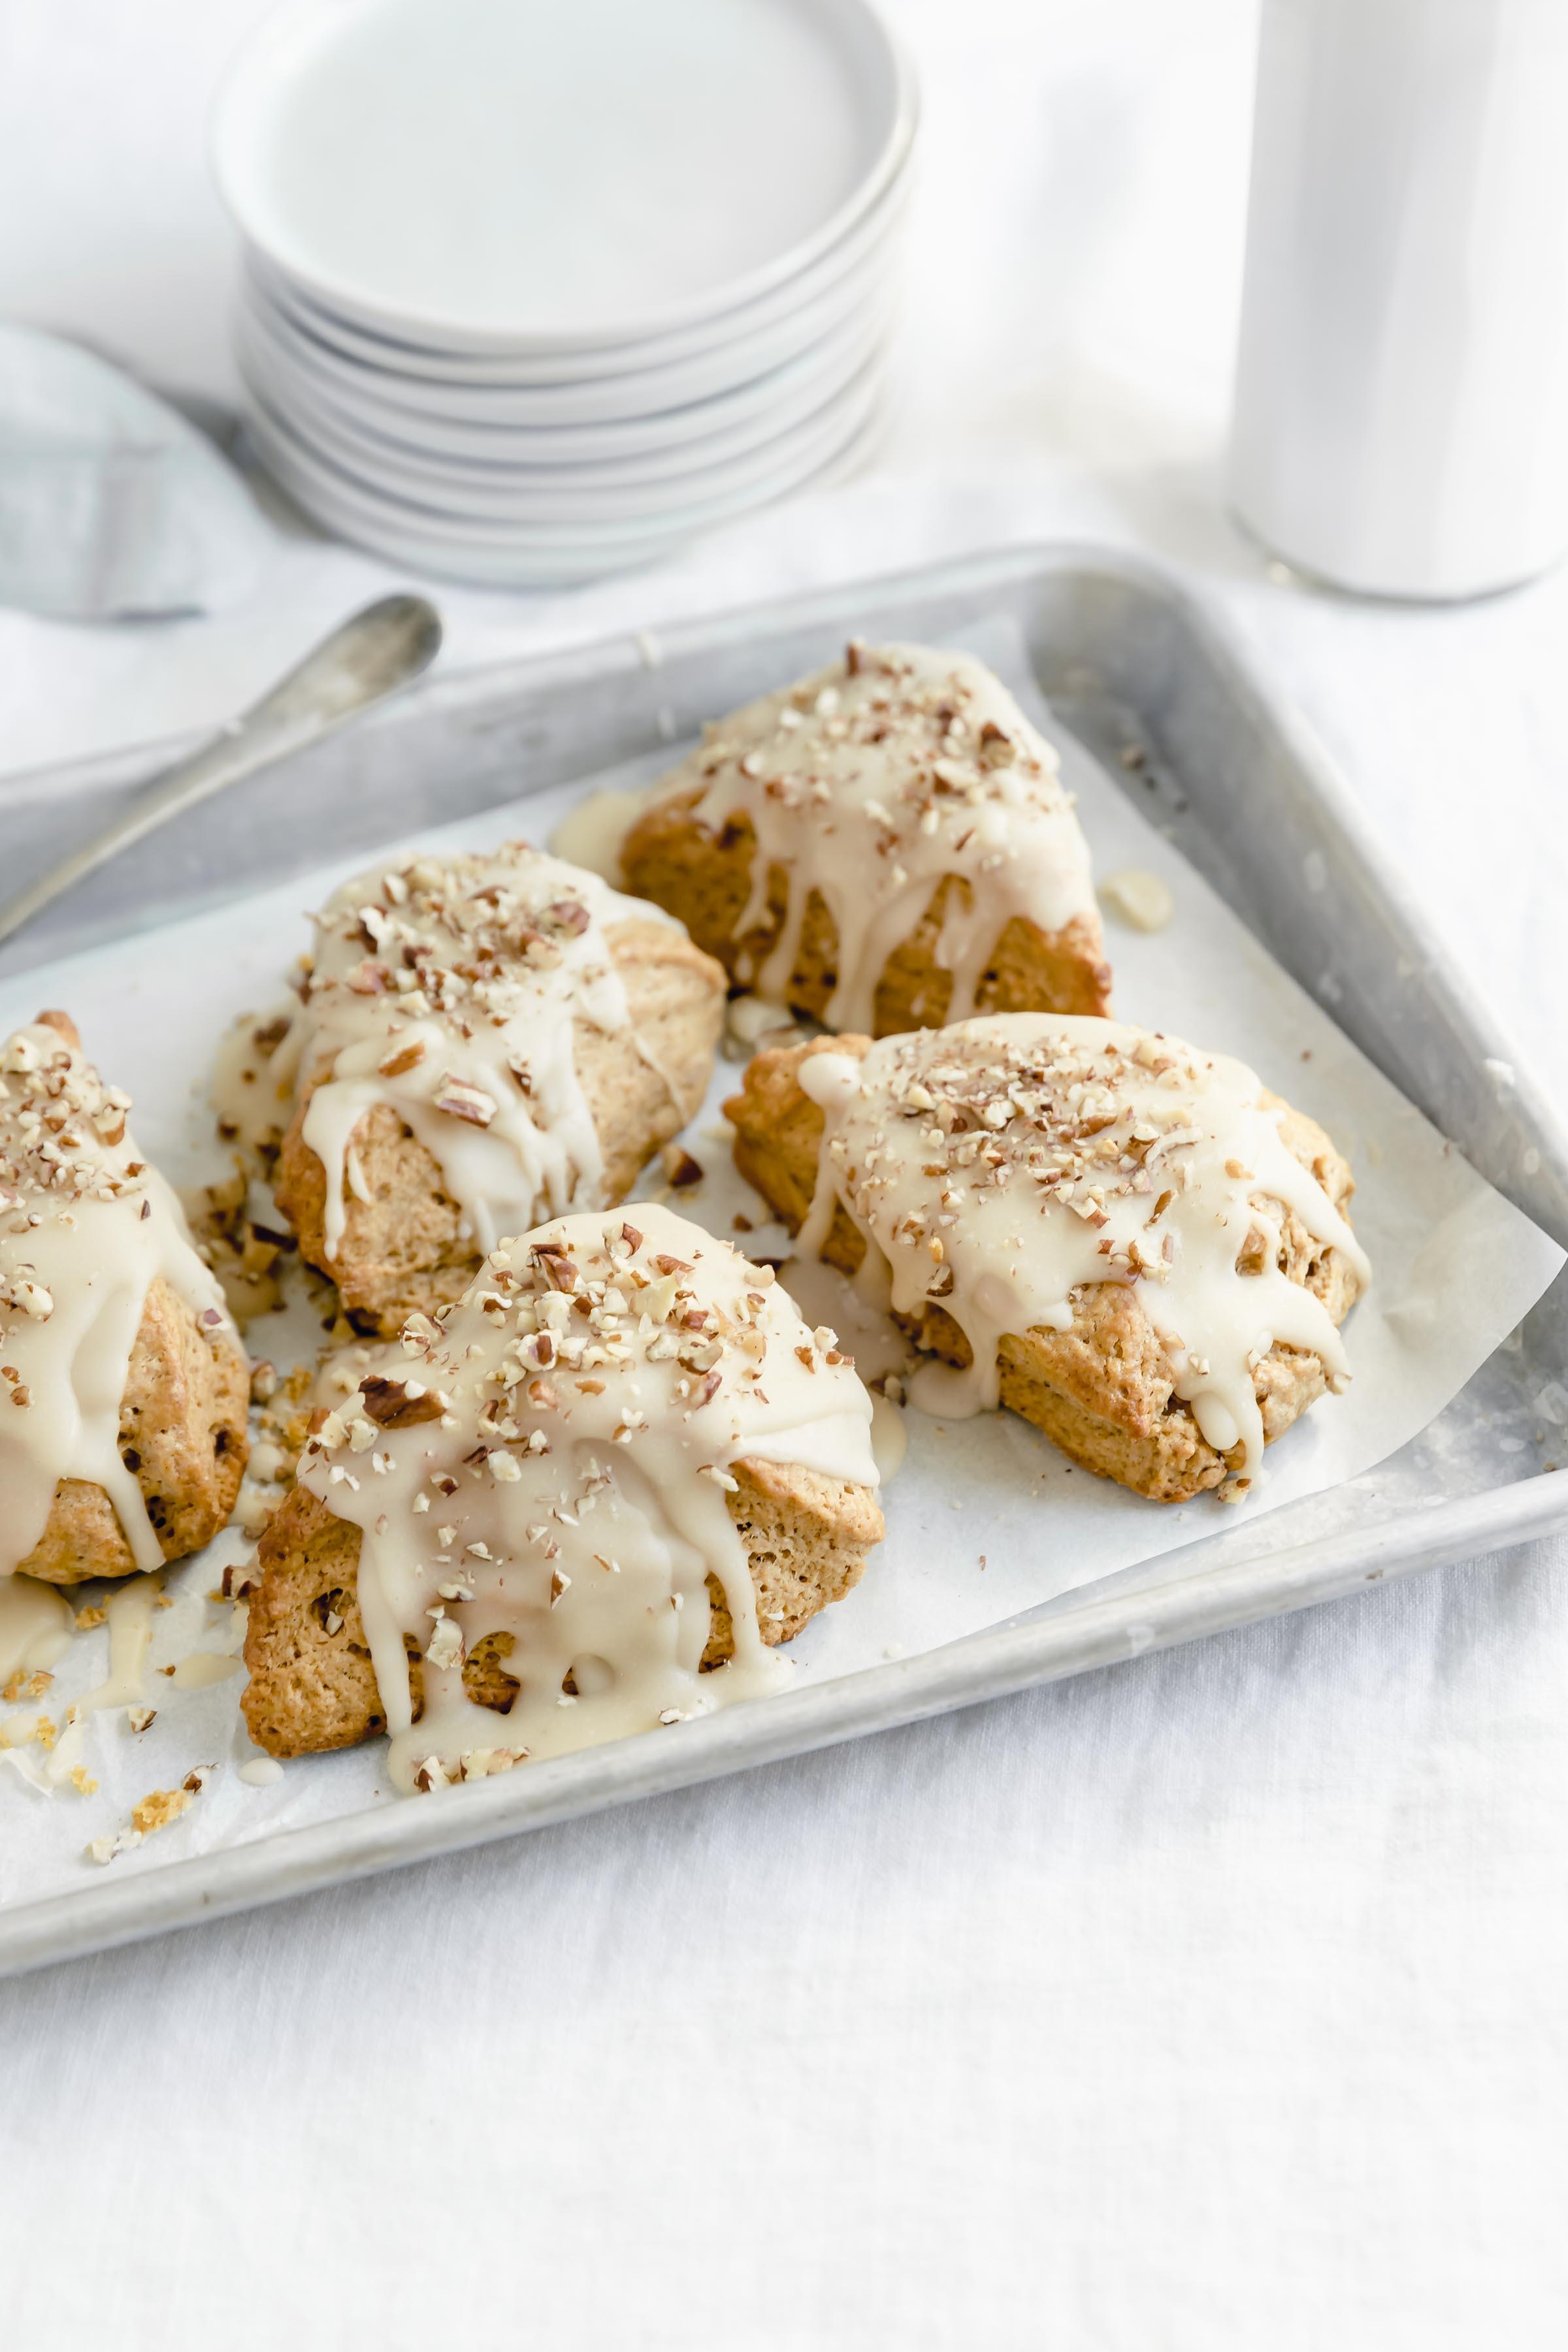 pan of moist pumpkin scones with maple glaze